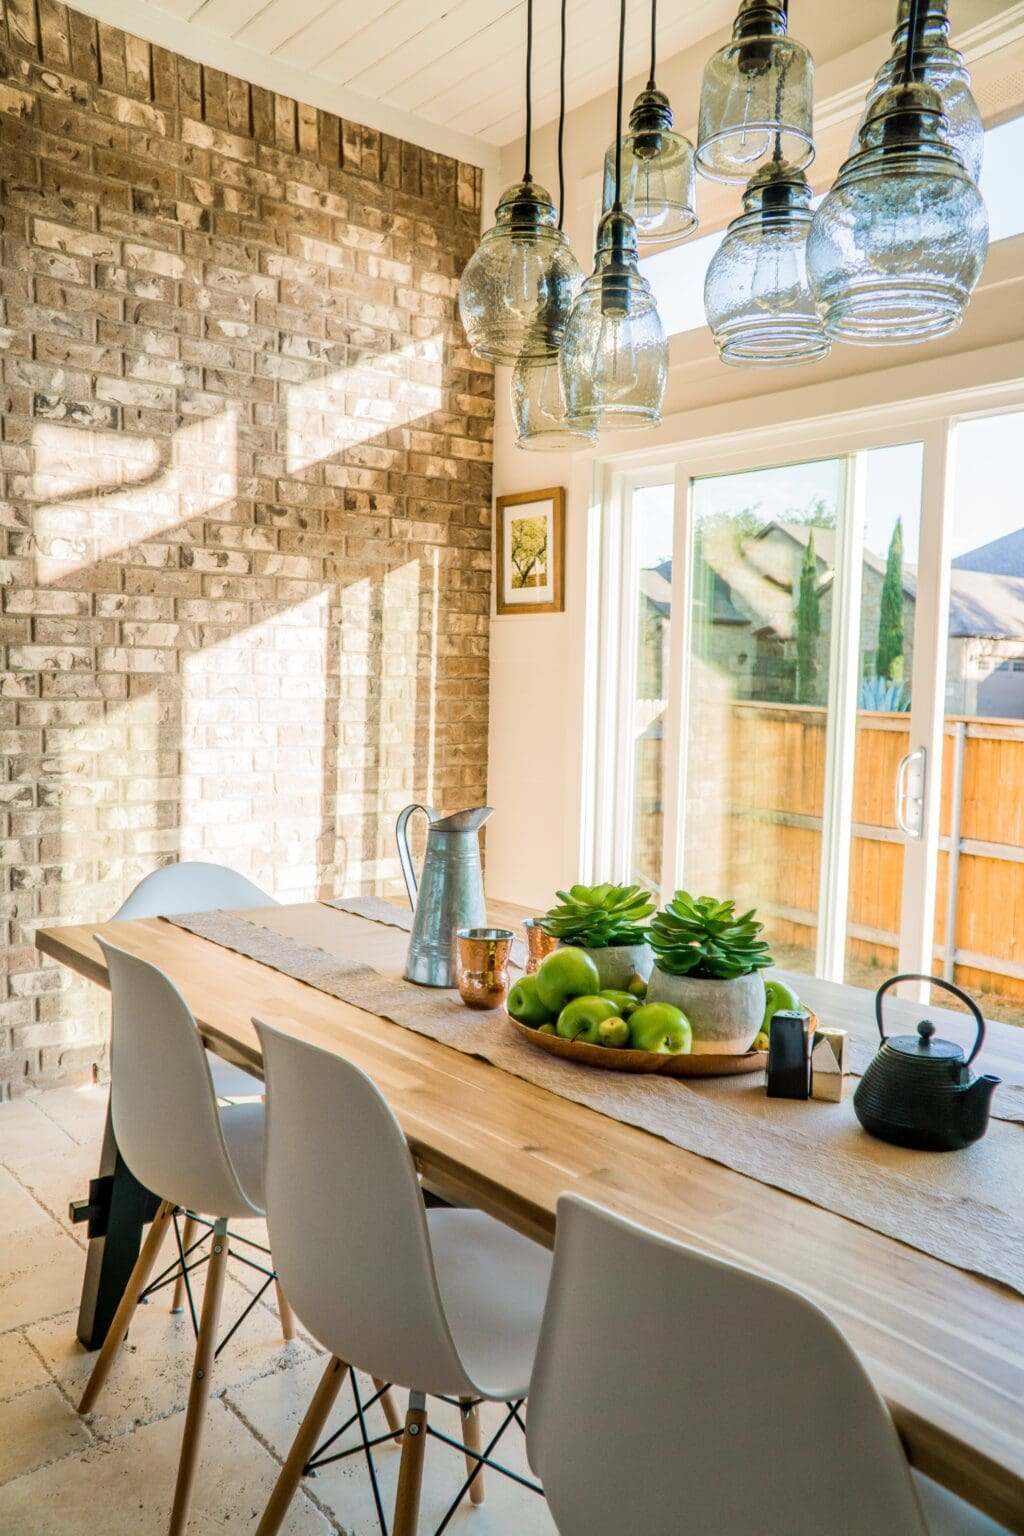 sun shining through patio window onto a dining room table